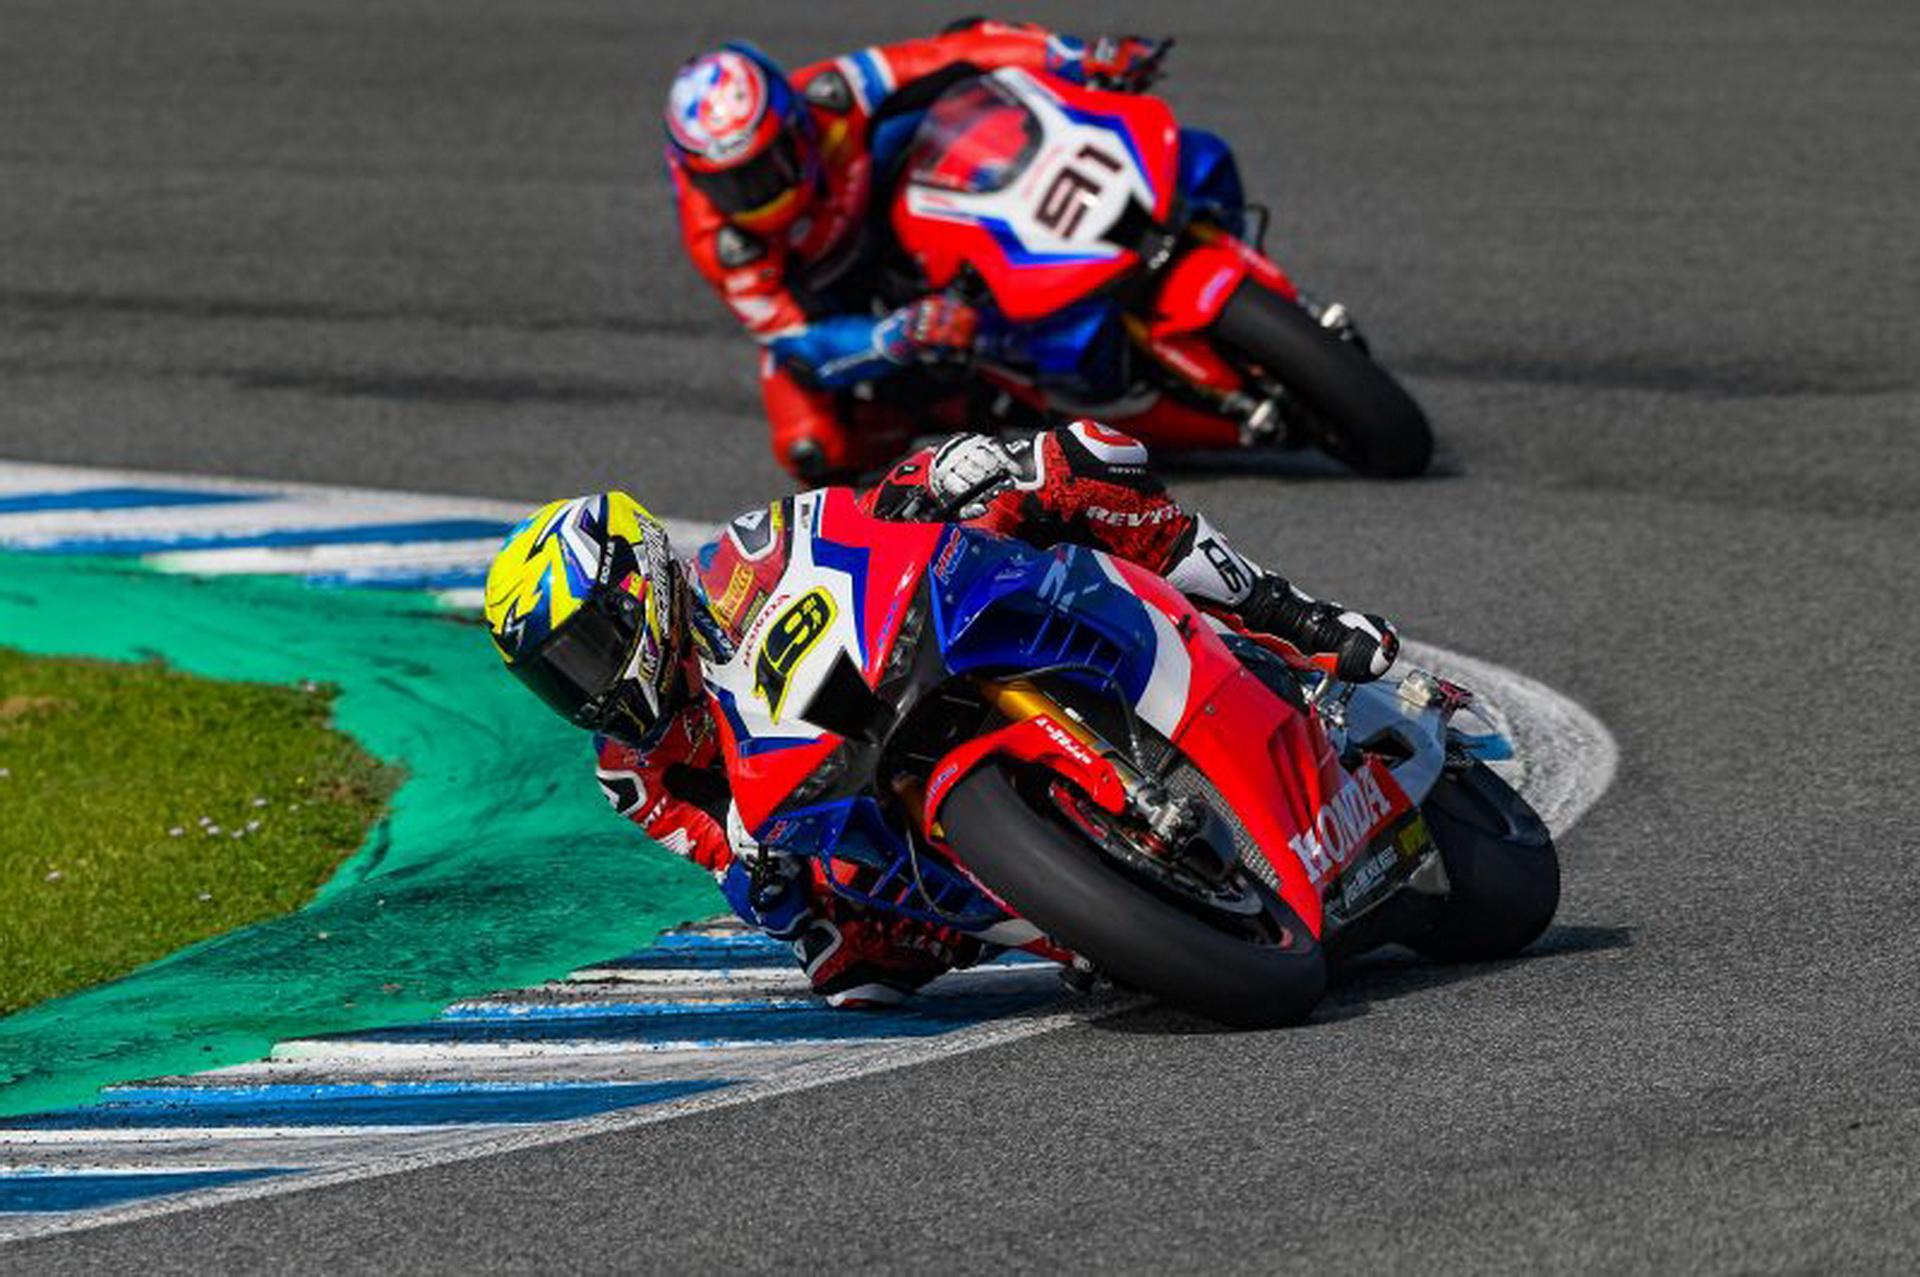 HRC prueba en Jerez – MotoGP y WorldSBK